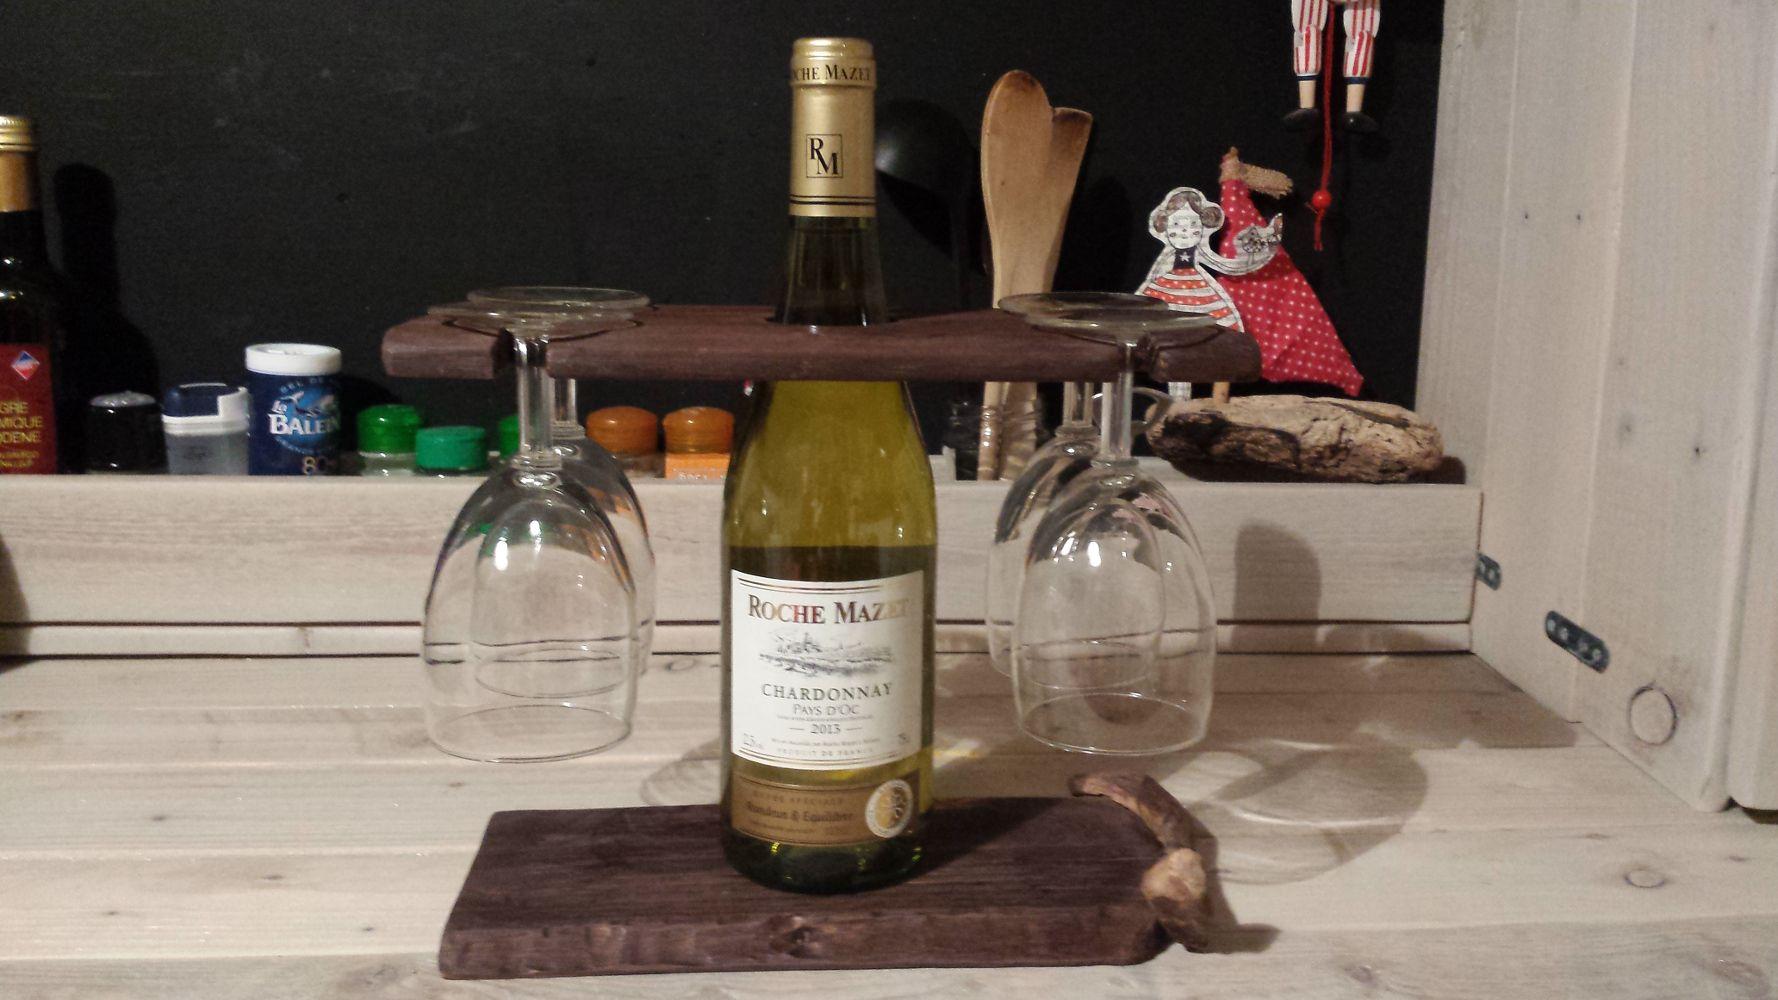 vin palette - Recherche Google